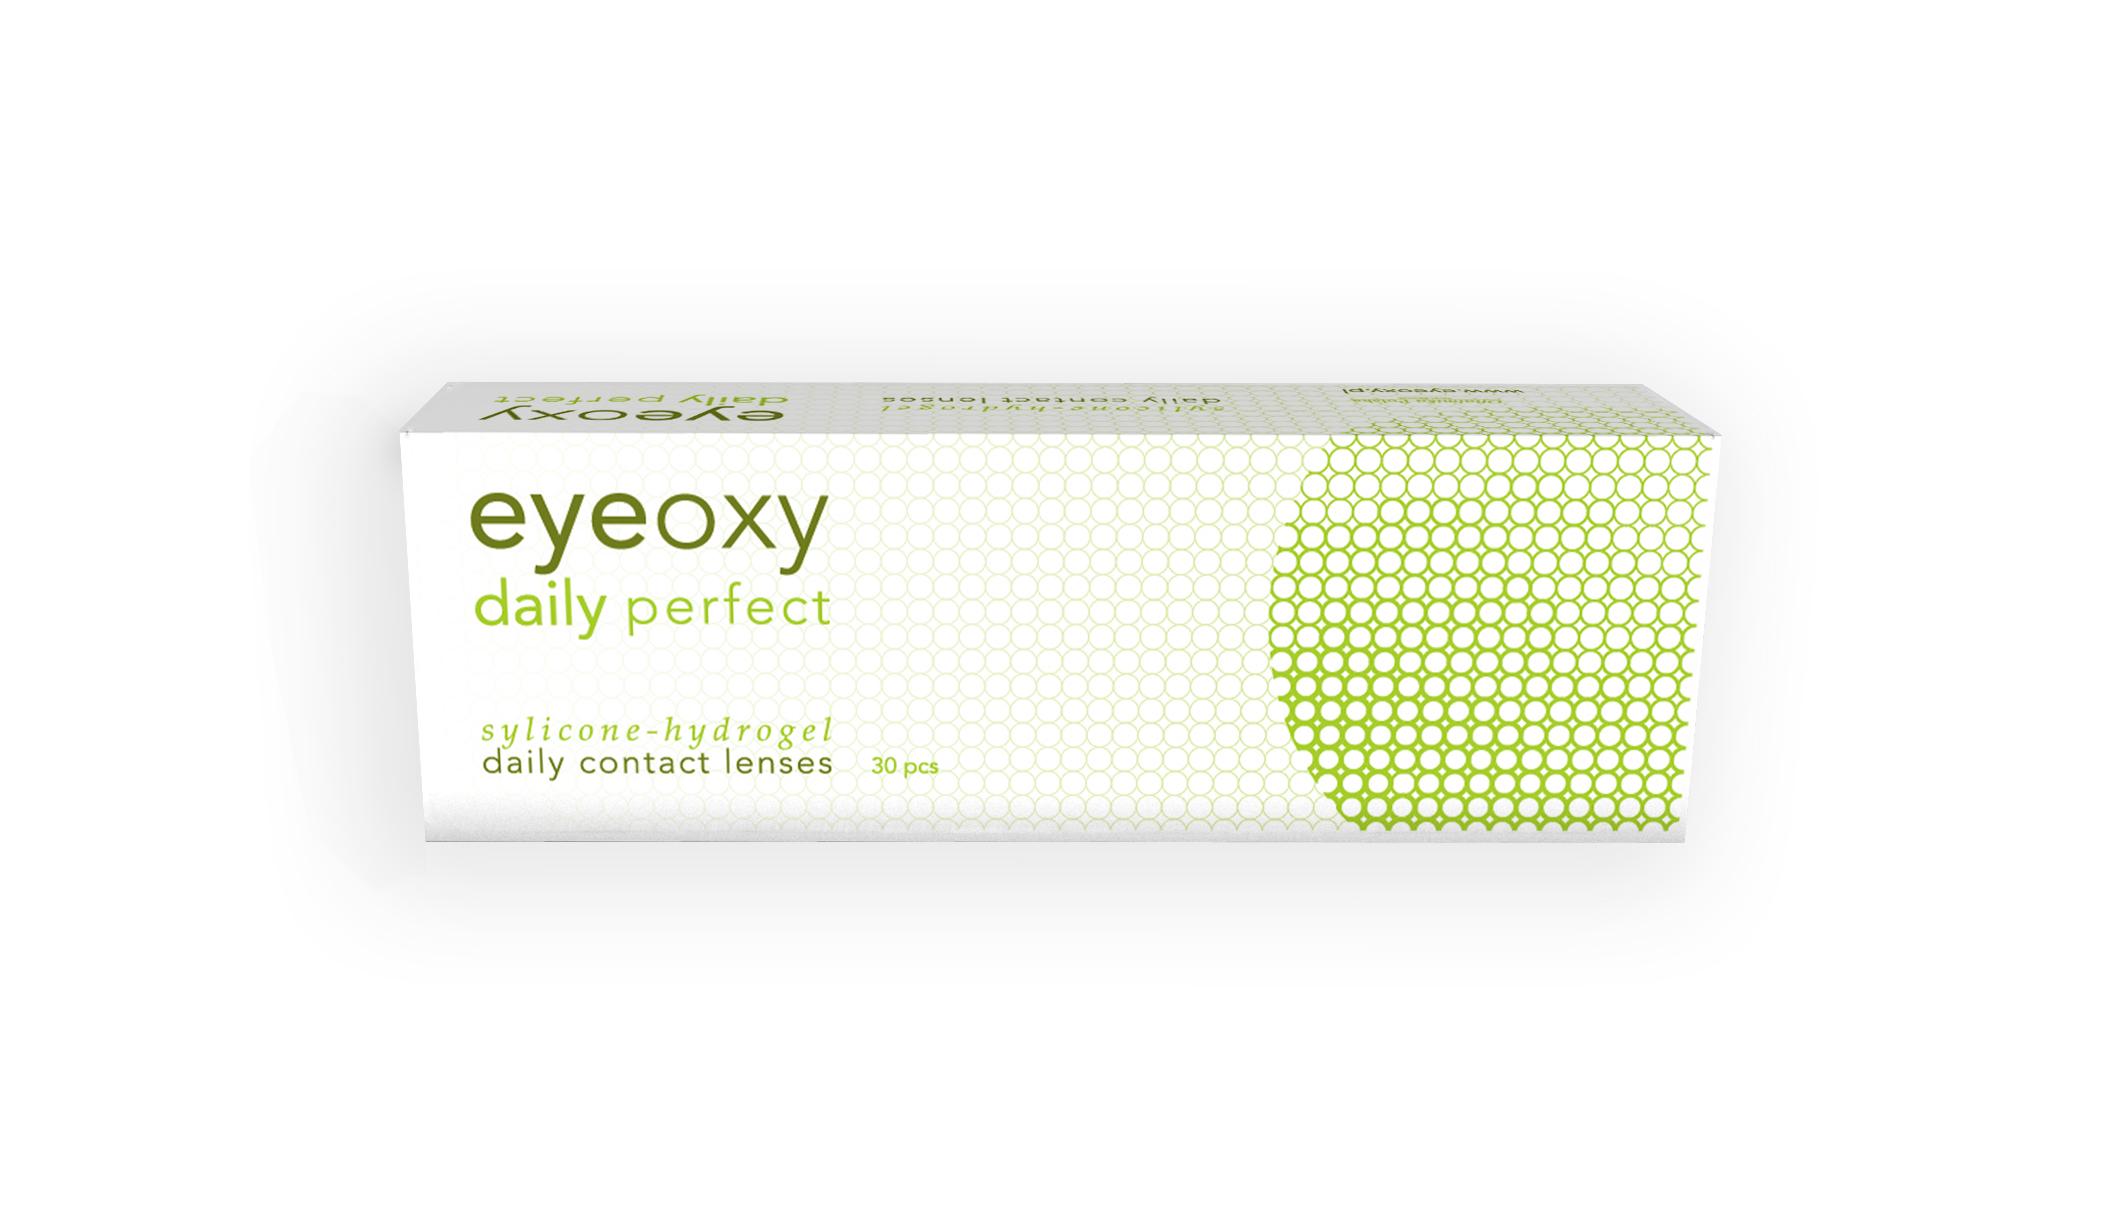 EyeoxyDailyPerfect_front